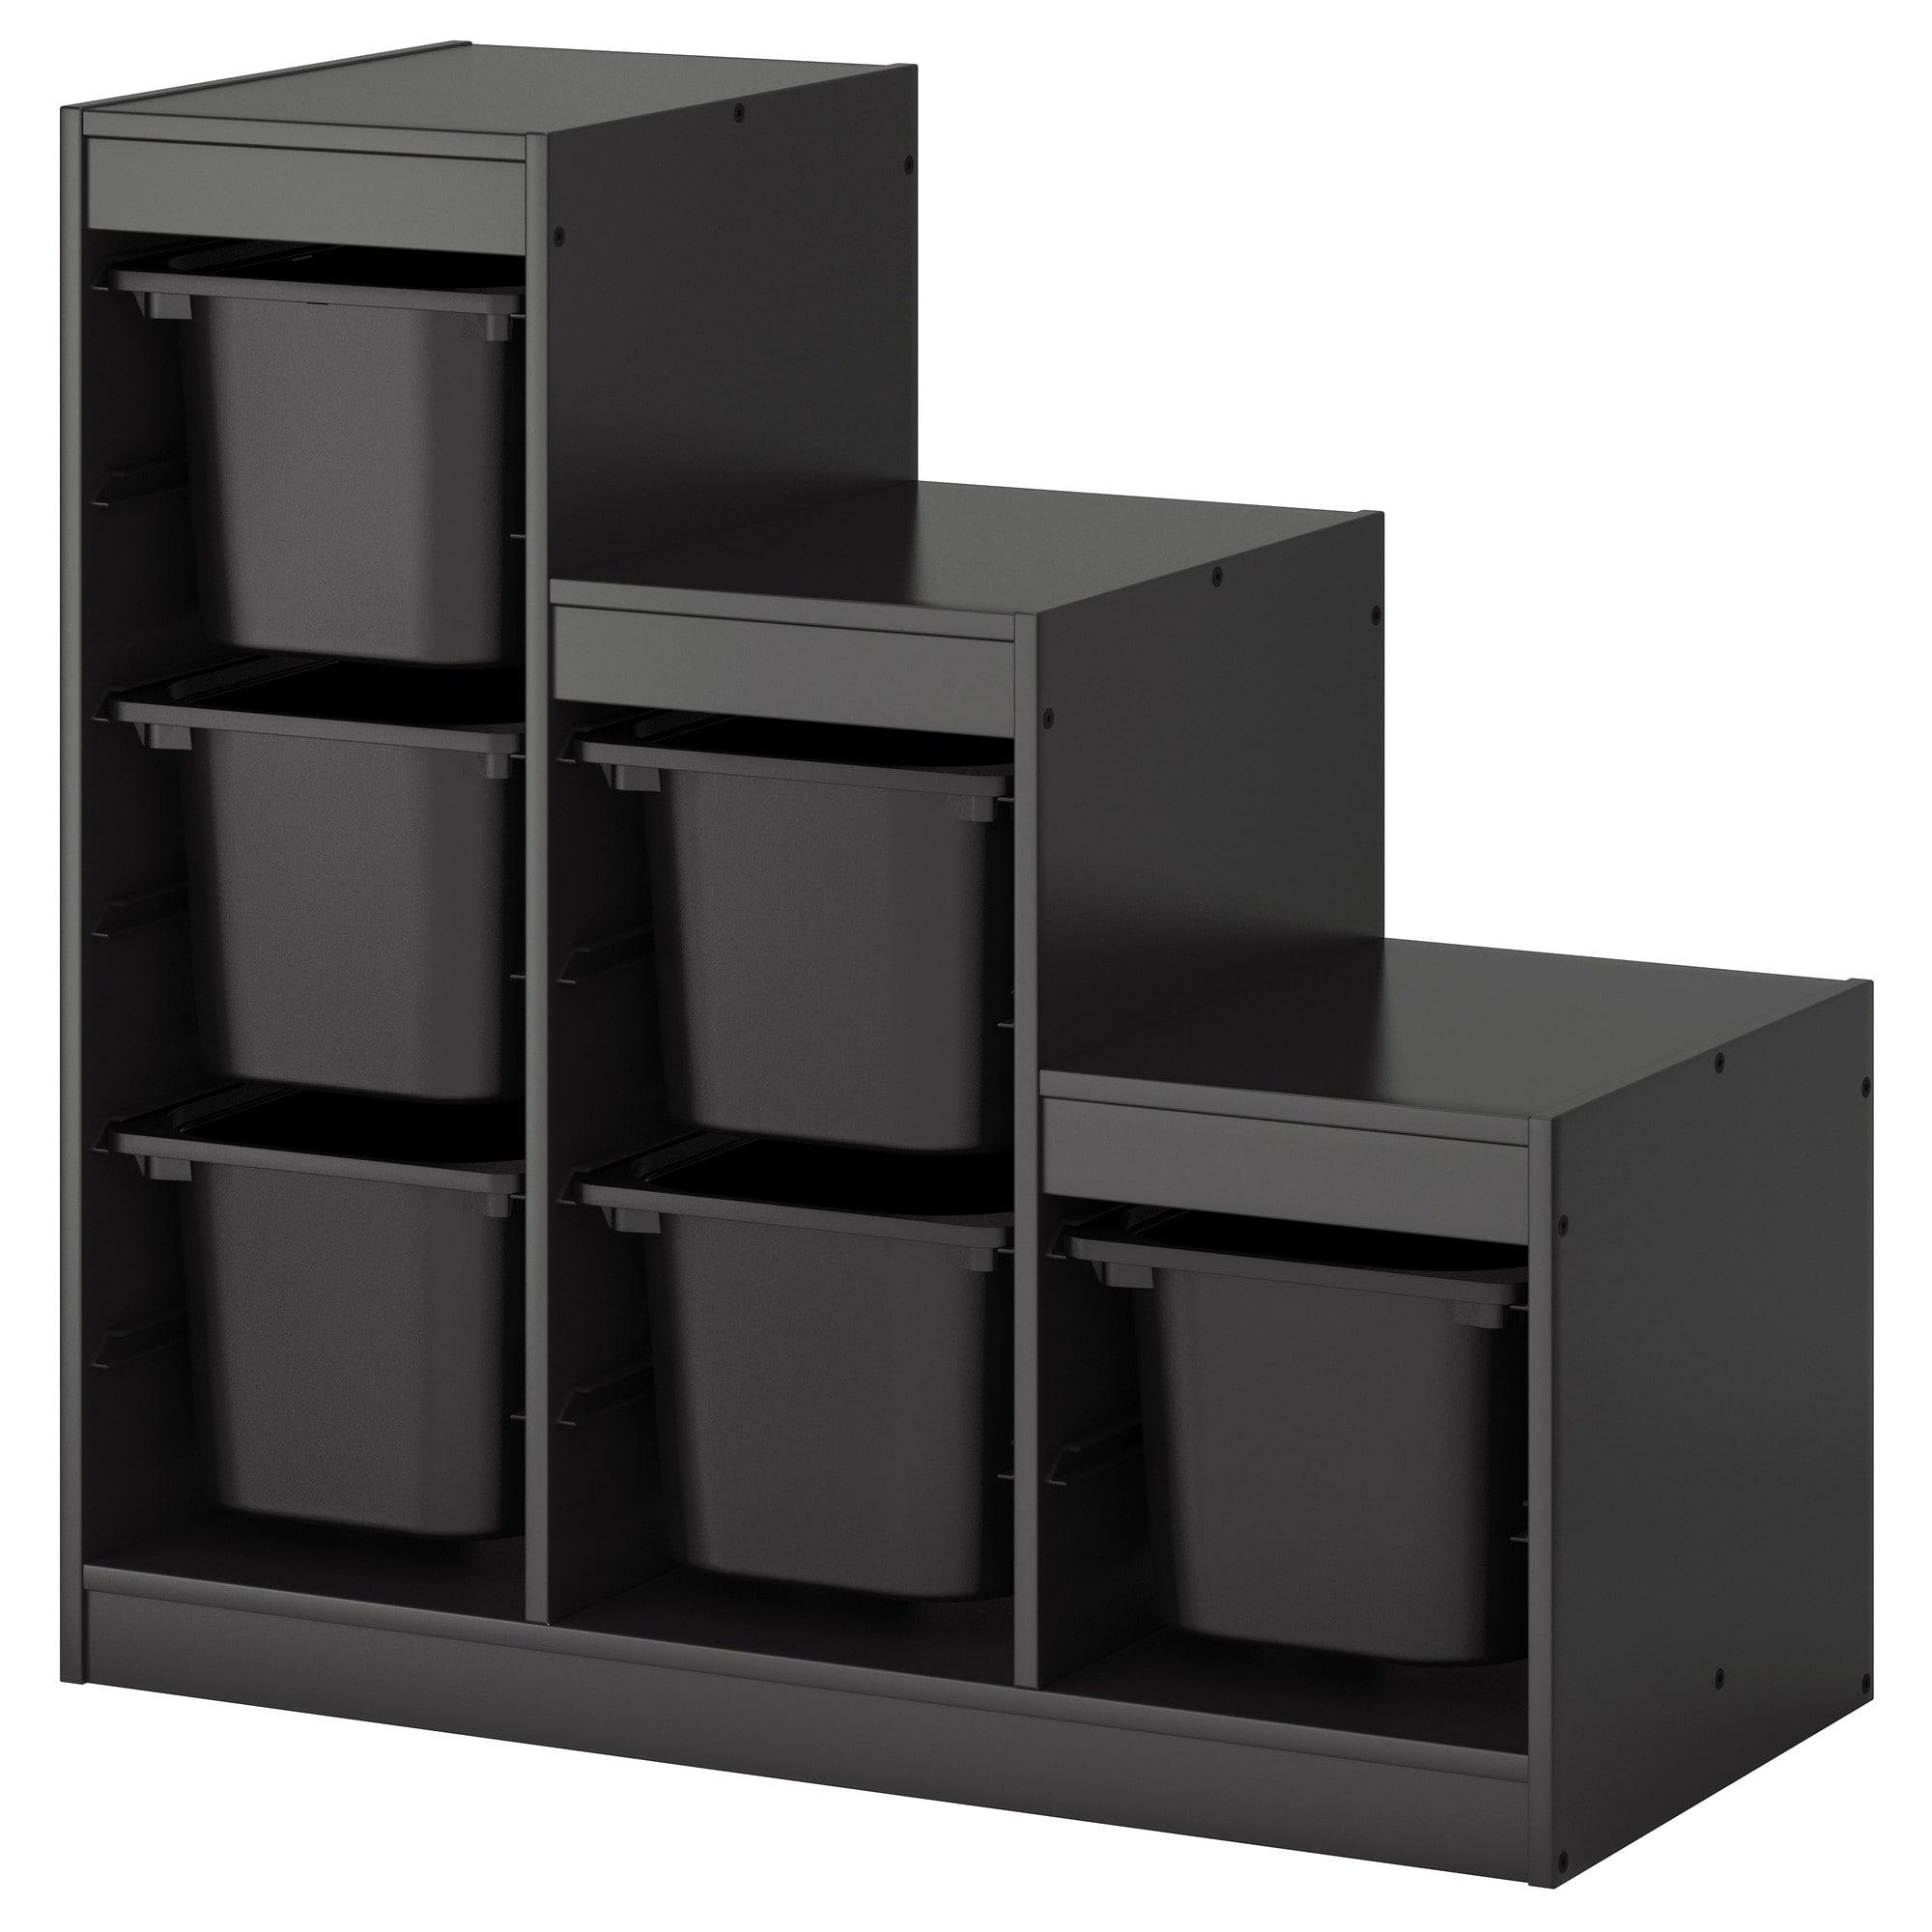 Dvd storage cabinet ikea  sc 1 st  Foter & Dvd Storage With Doors - Foter